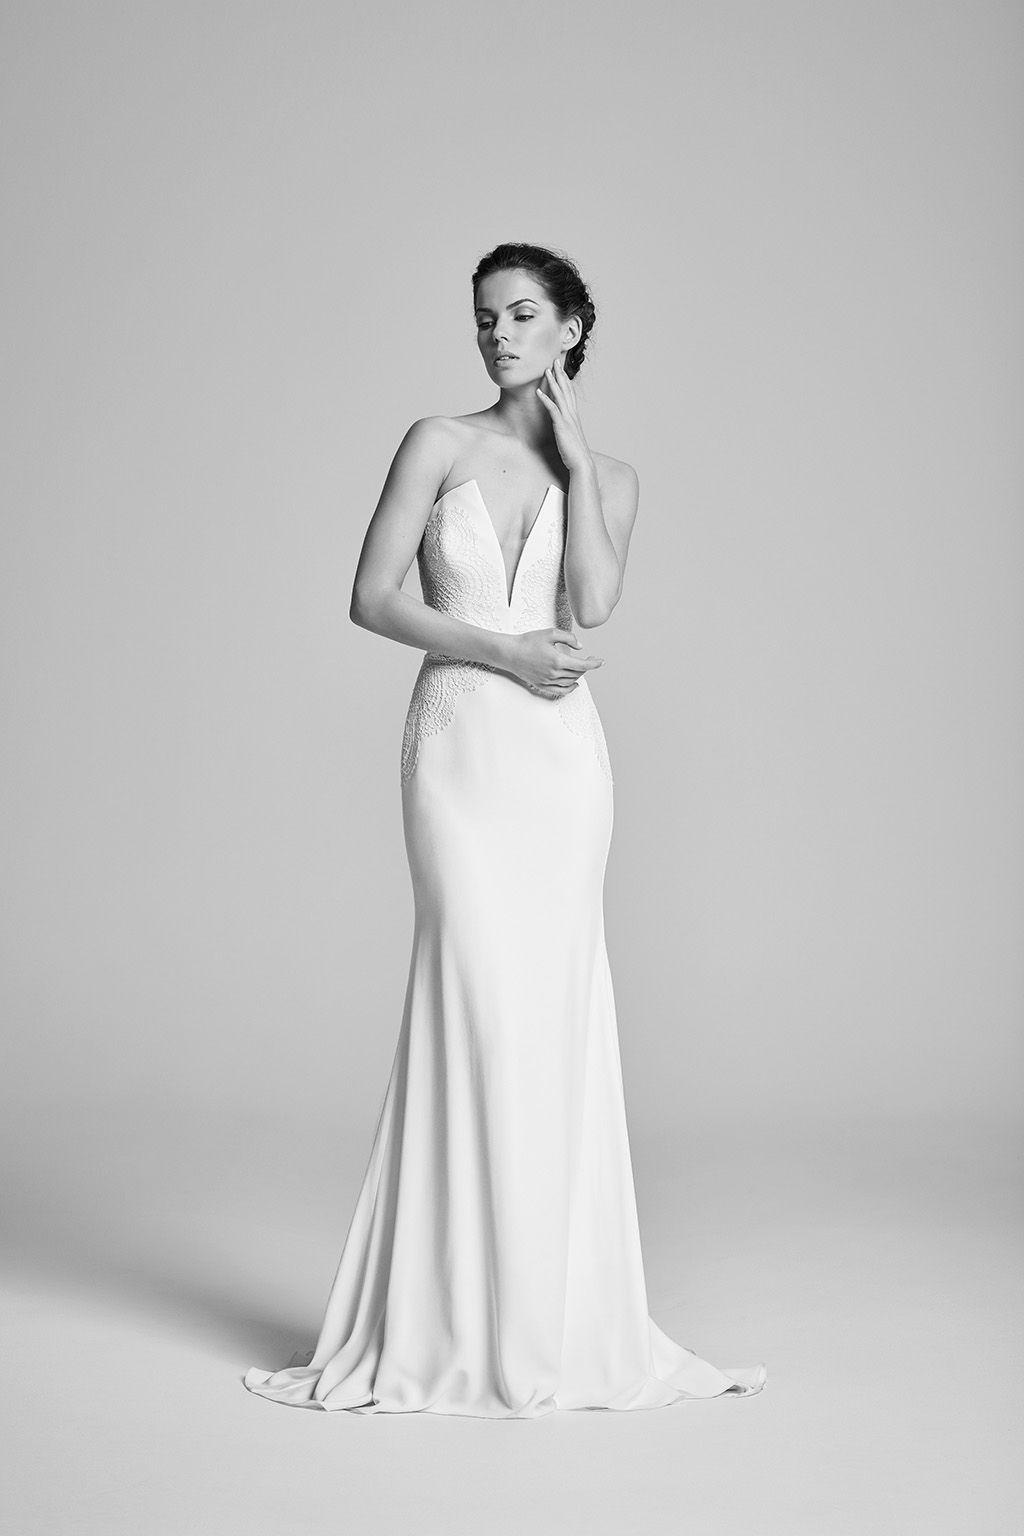 suzanne neville delphine-wedding-dresses-uk-belle-epoque-collection ...